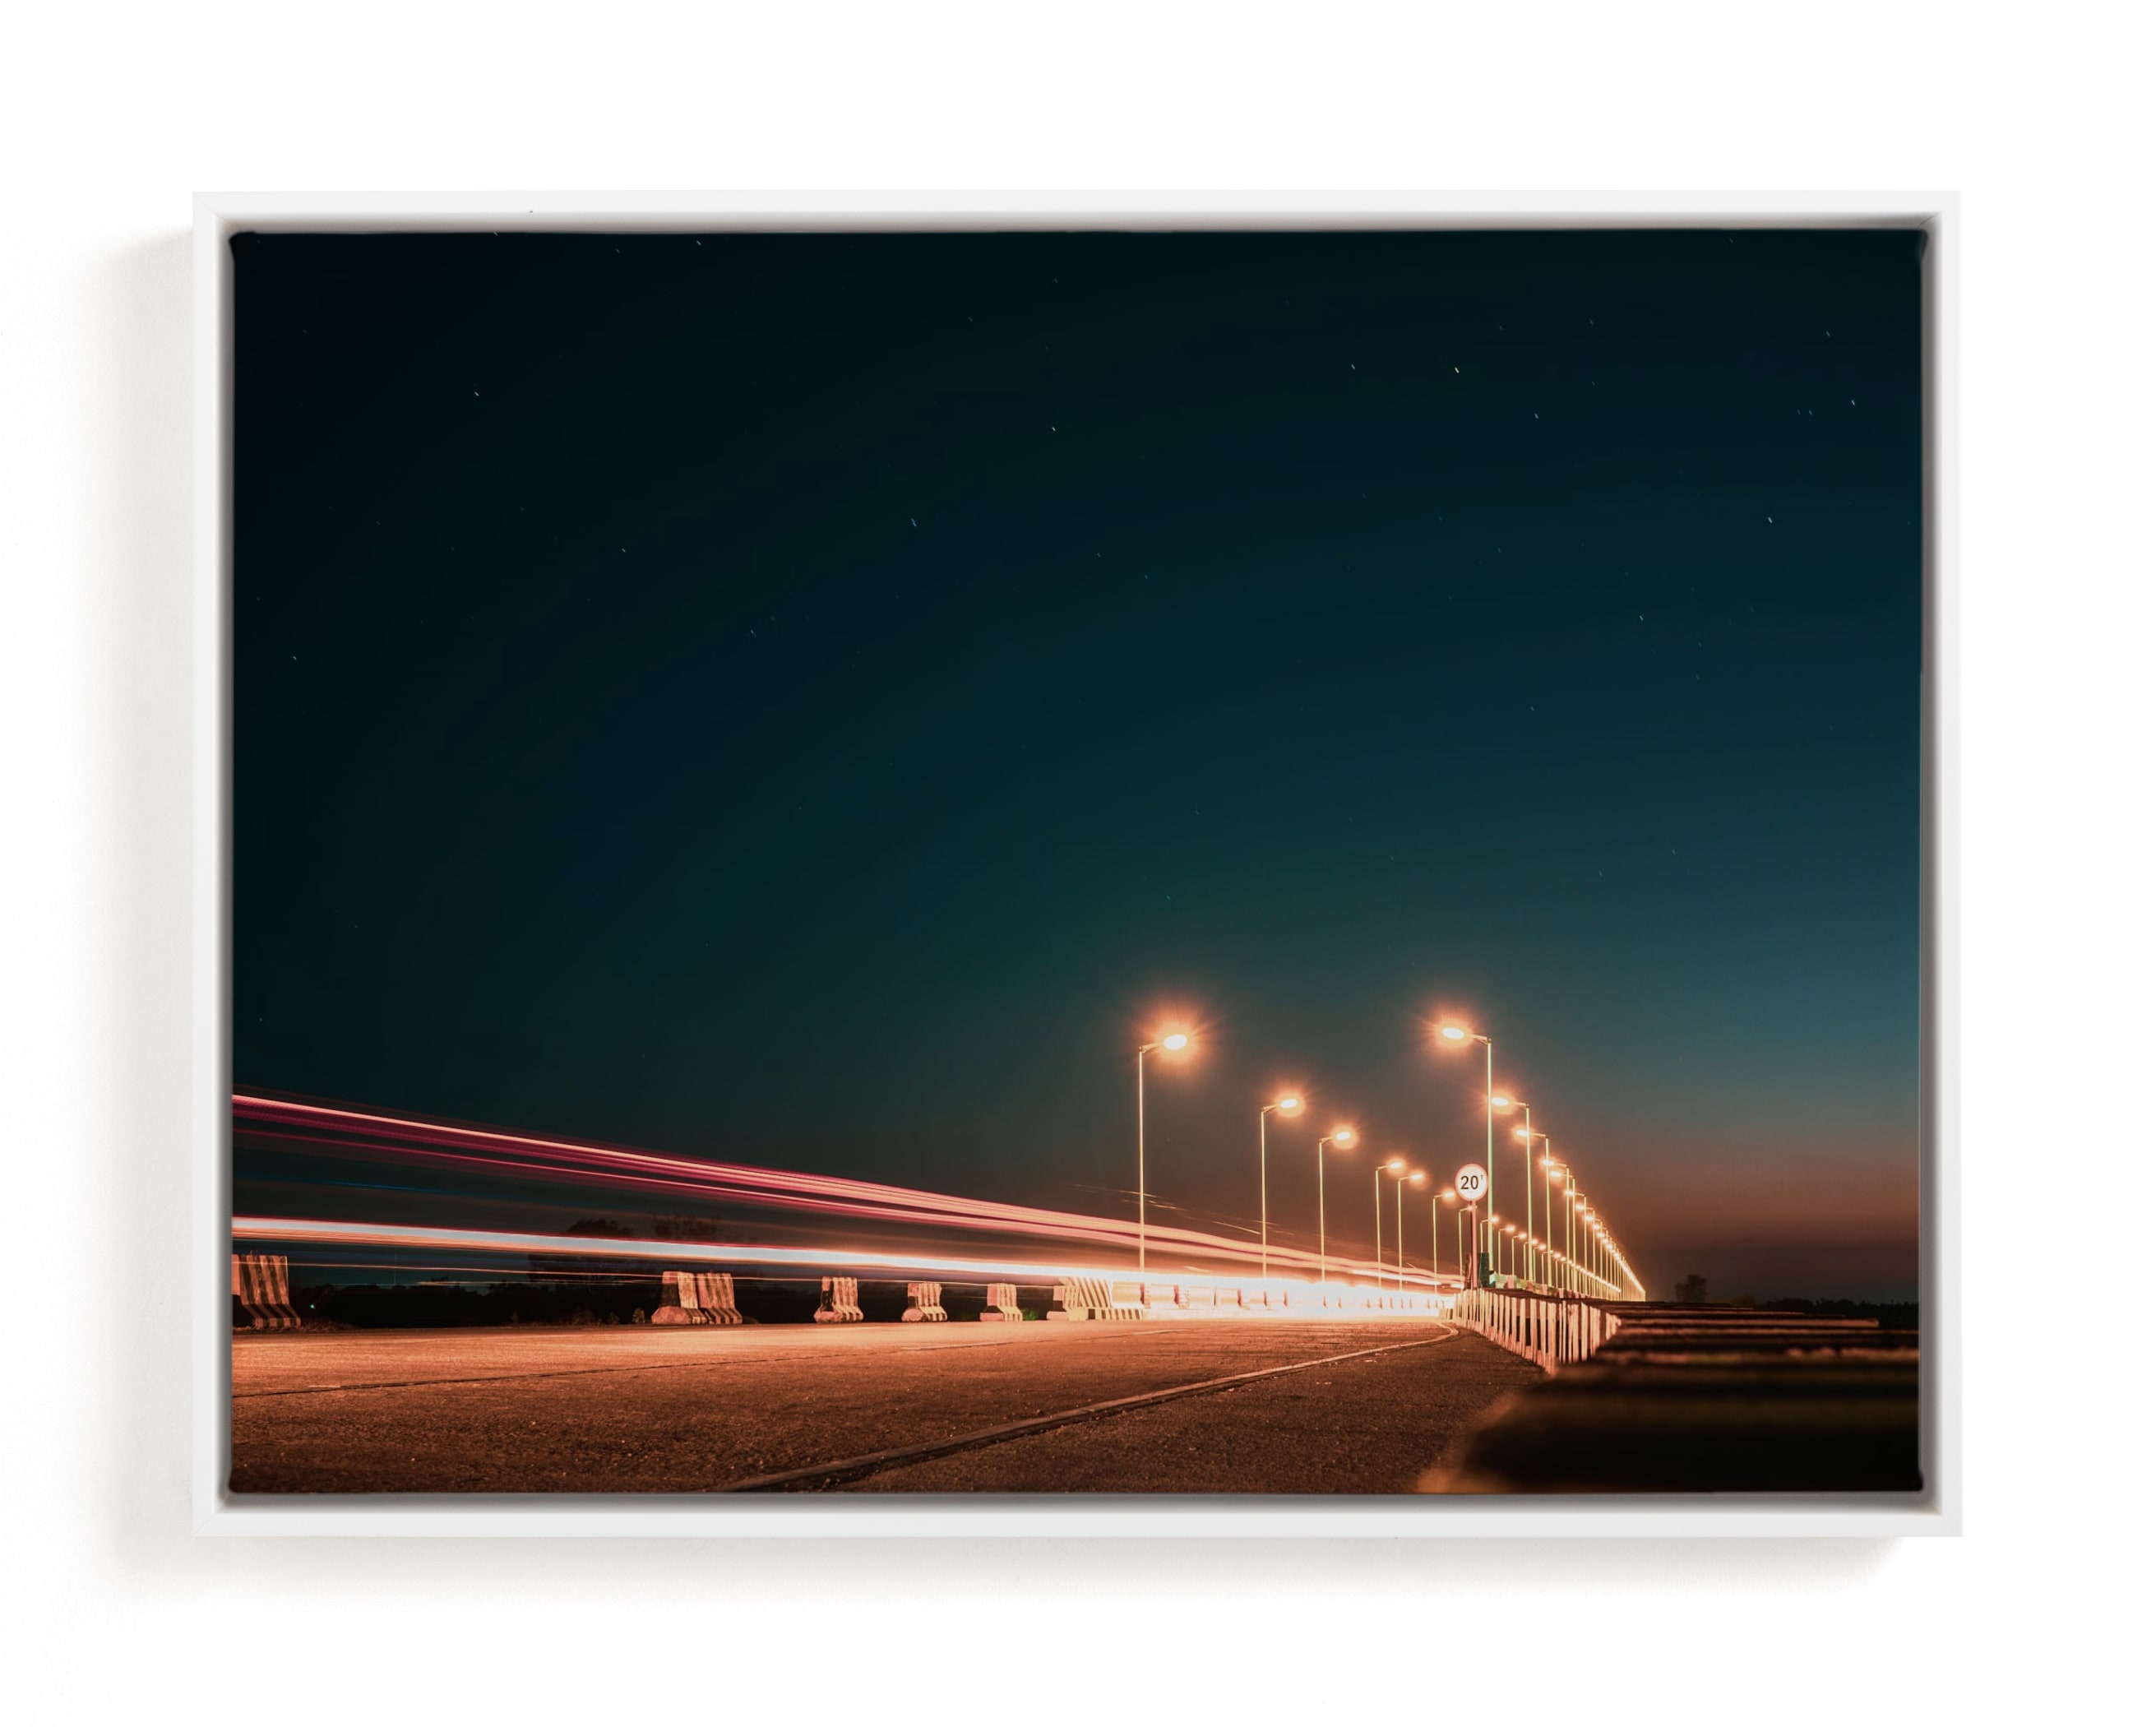 The Fast Bridge Art Print